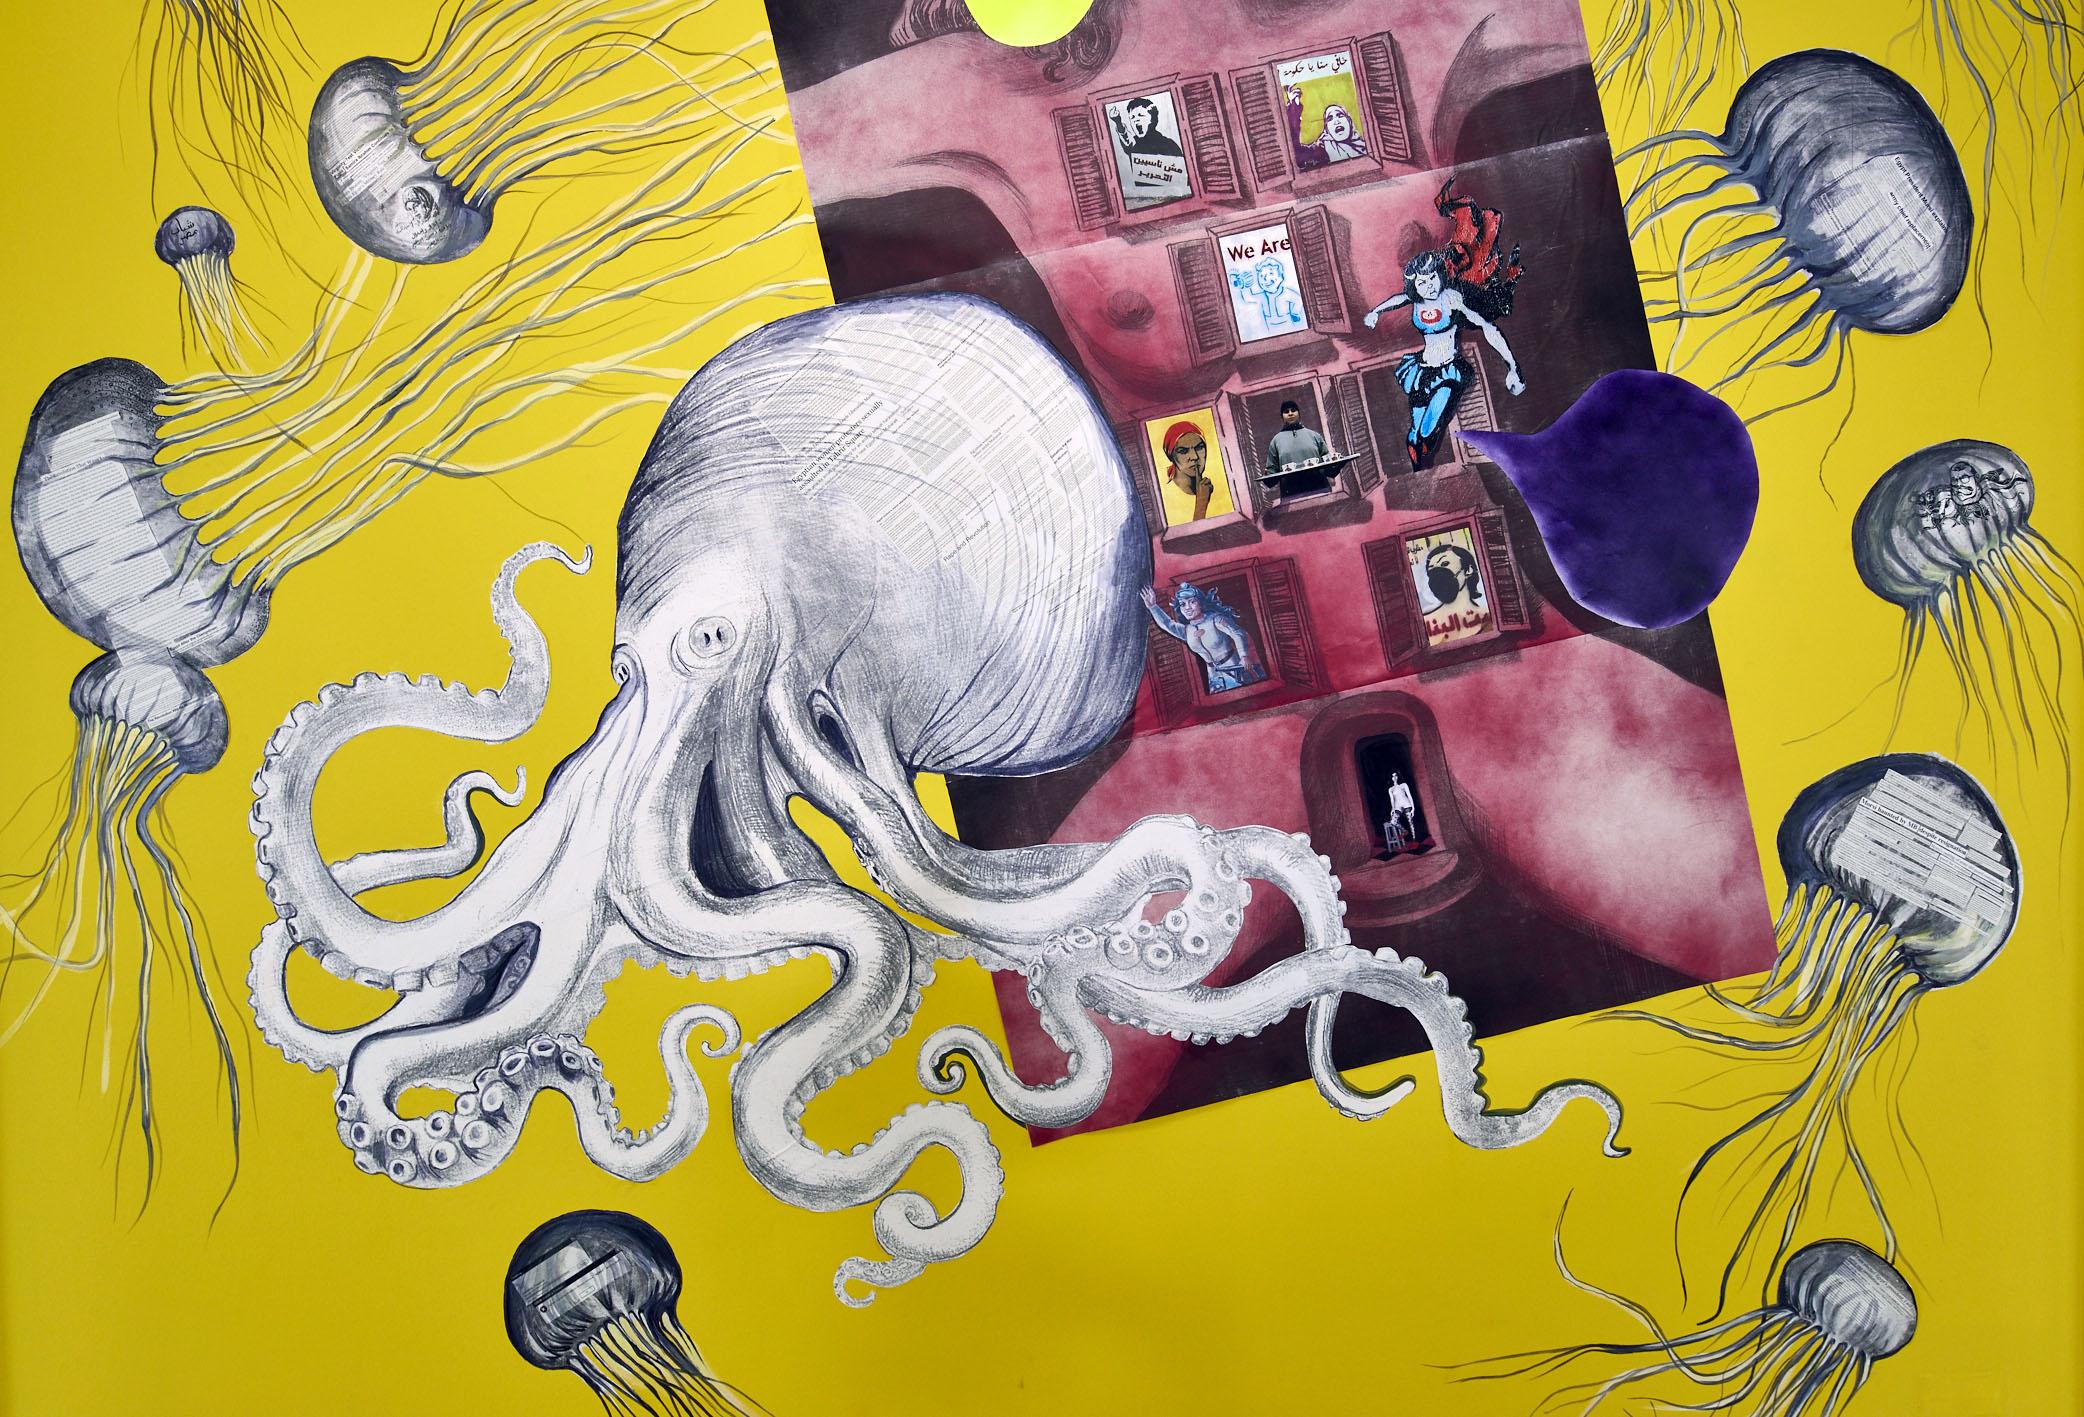 octopus_098 copy.jpg